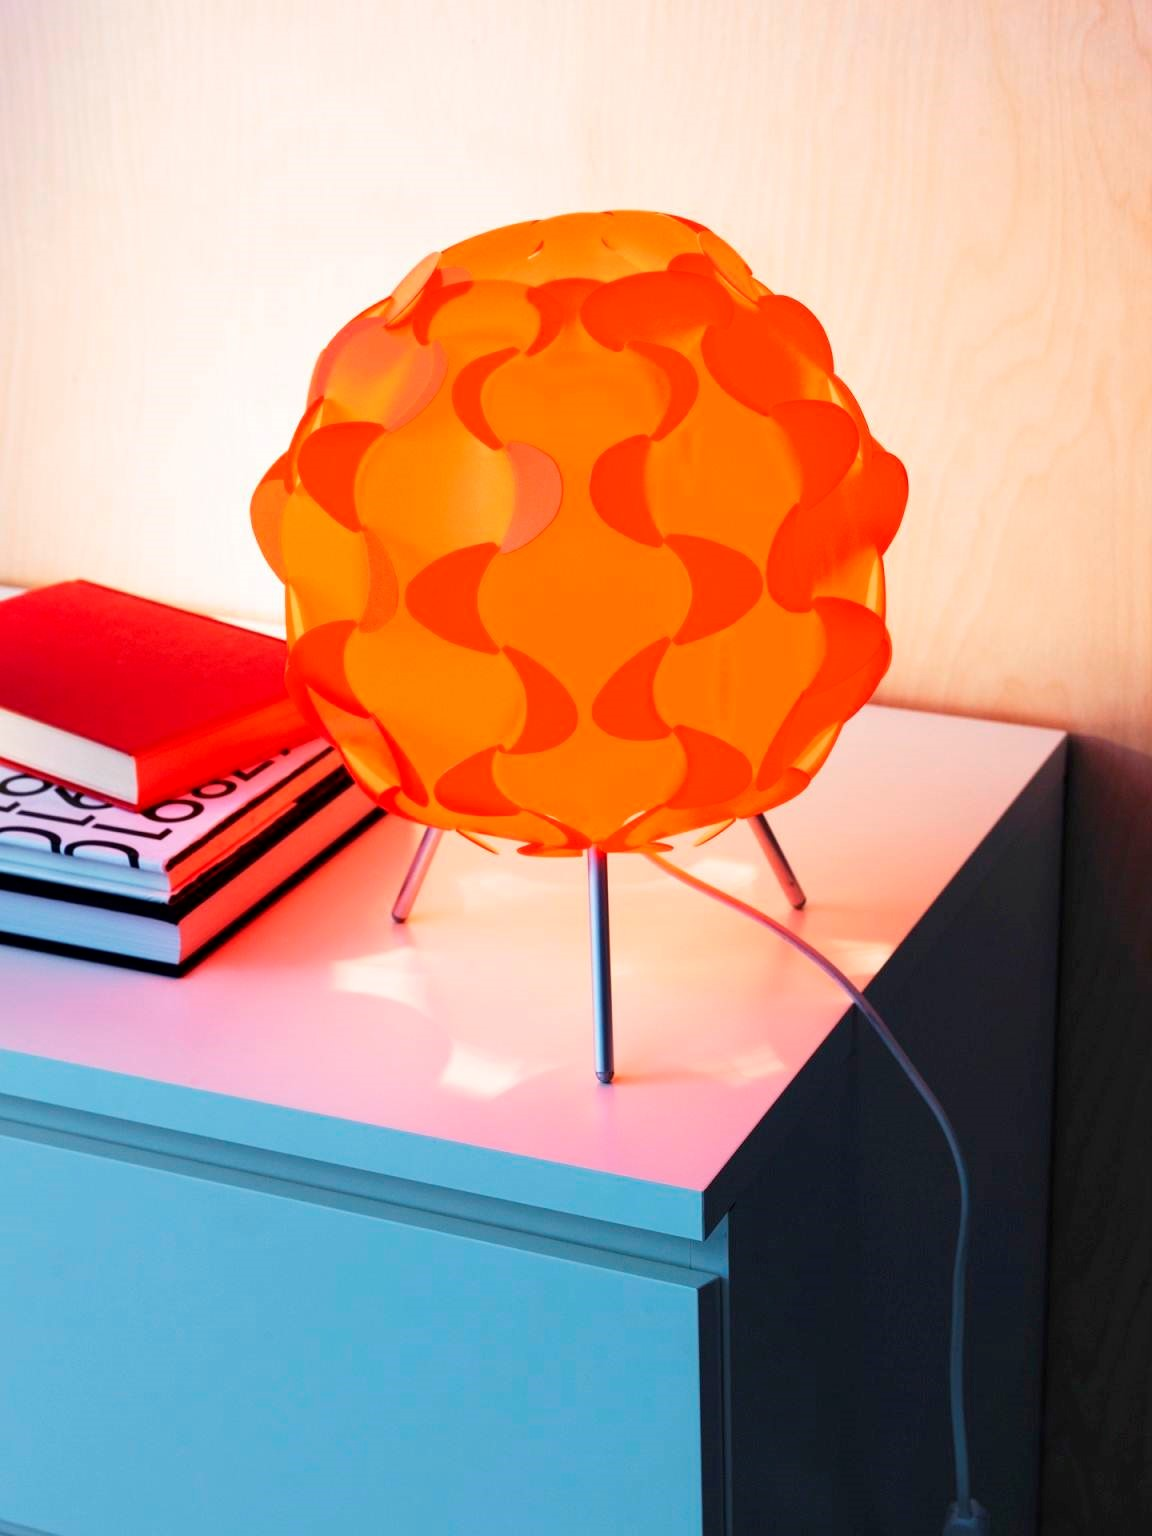 FILLSTA橘色桌燈的柔和光線,可為居家空間營造柔和溫馨的氣氛(原價$699/特價$299) 圖片提供_IKEA